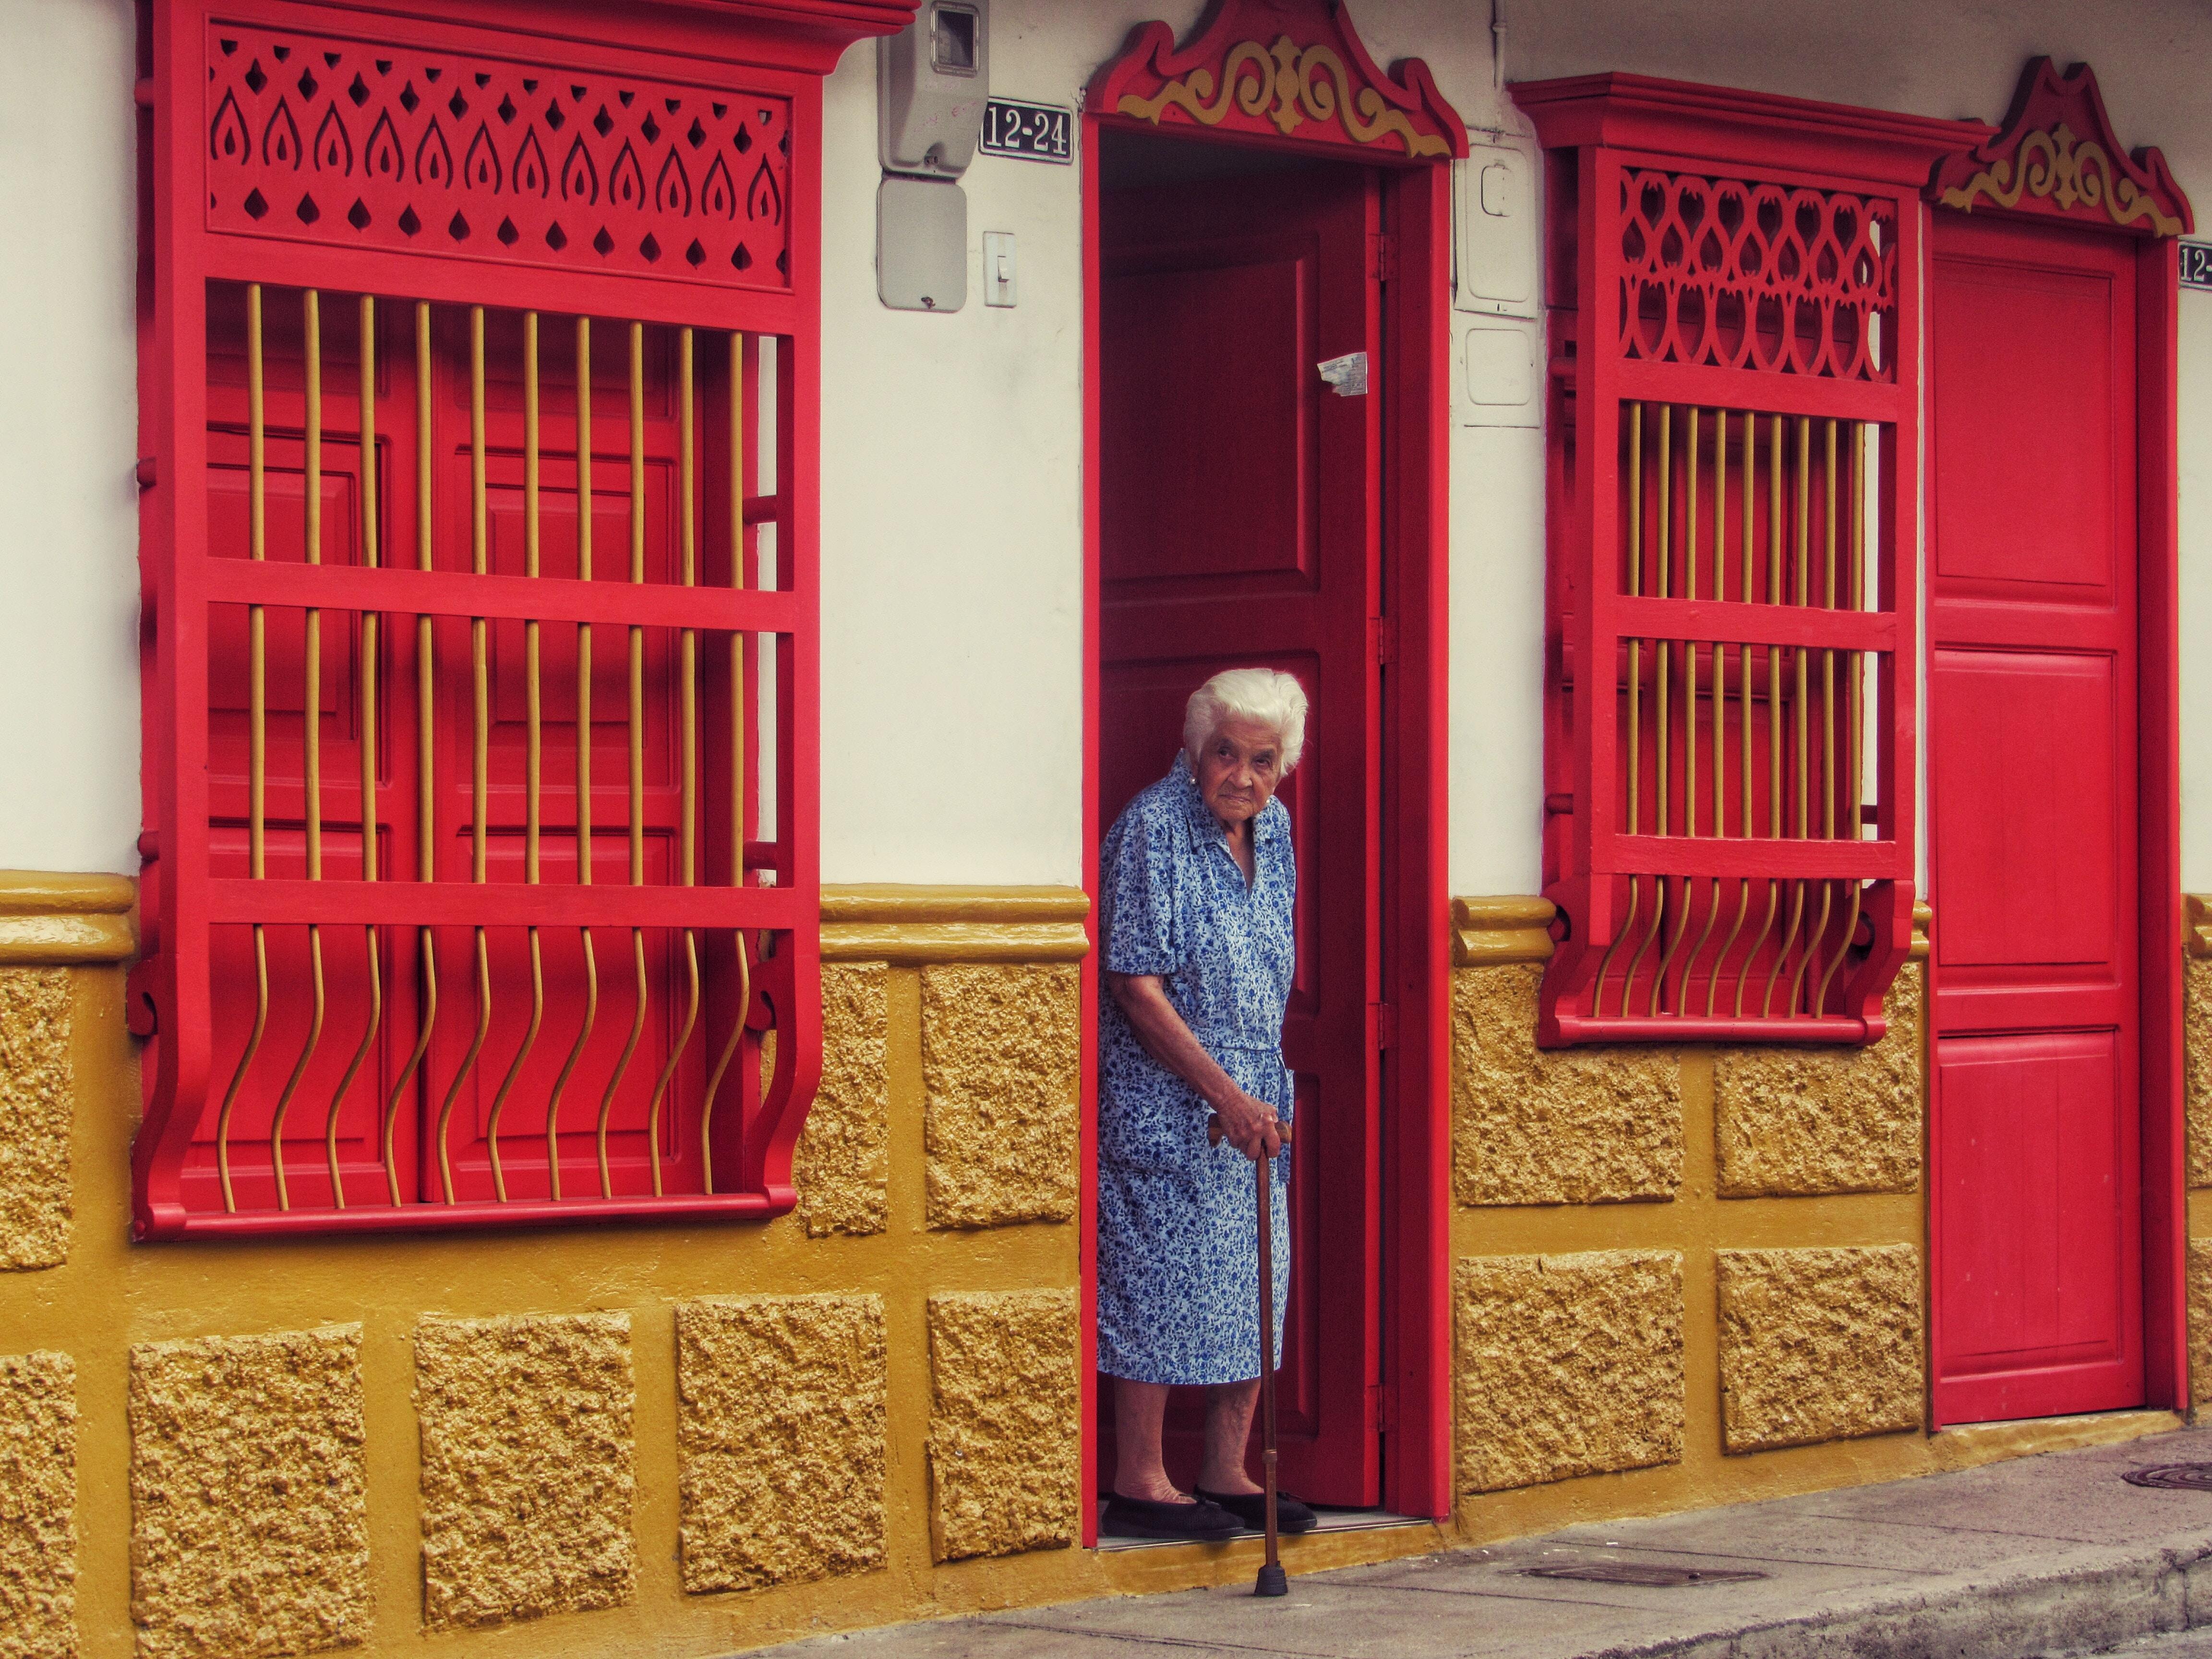 Free Unsplash photo from Aleja Así A Secas